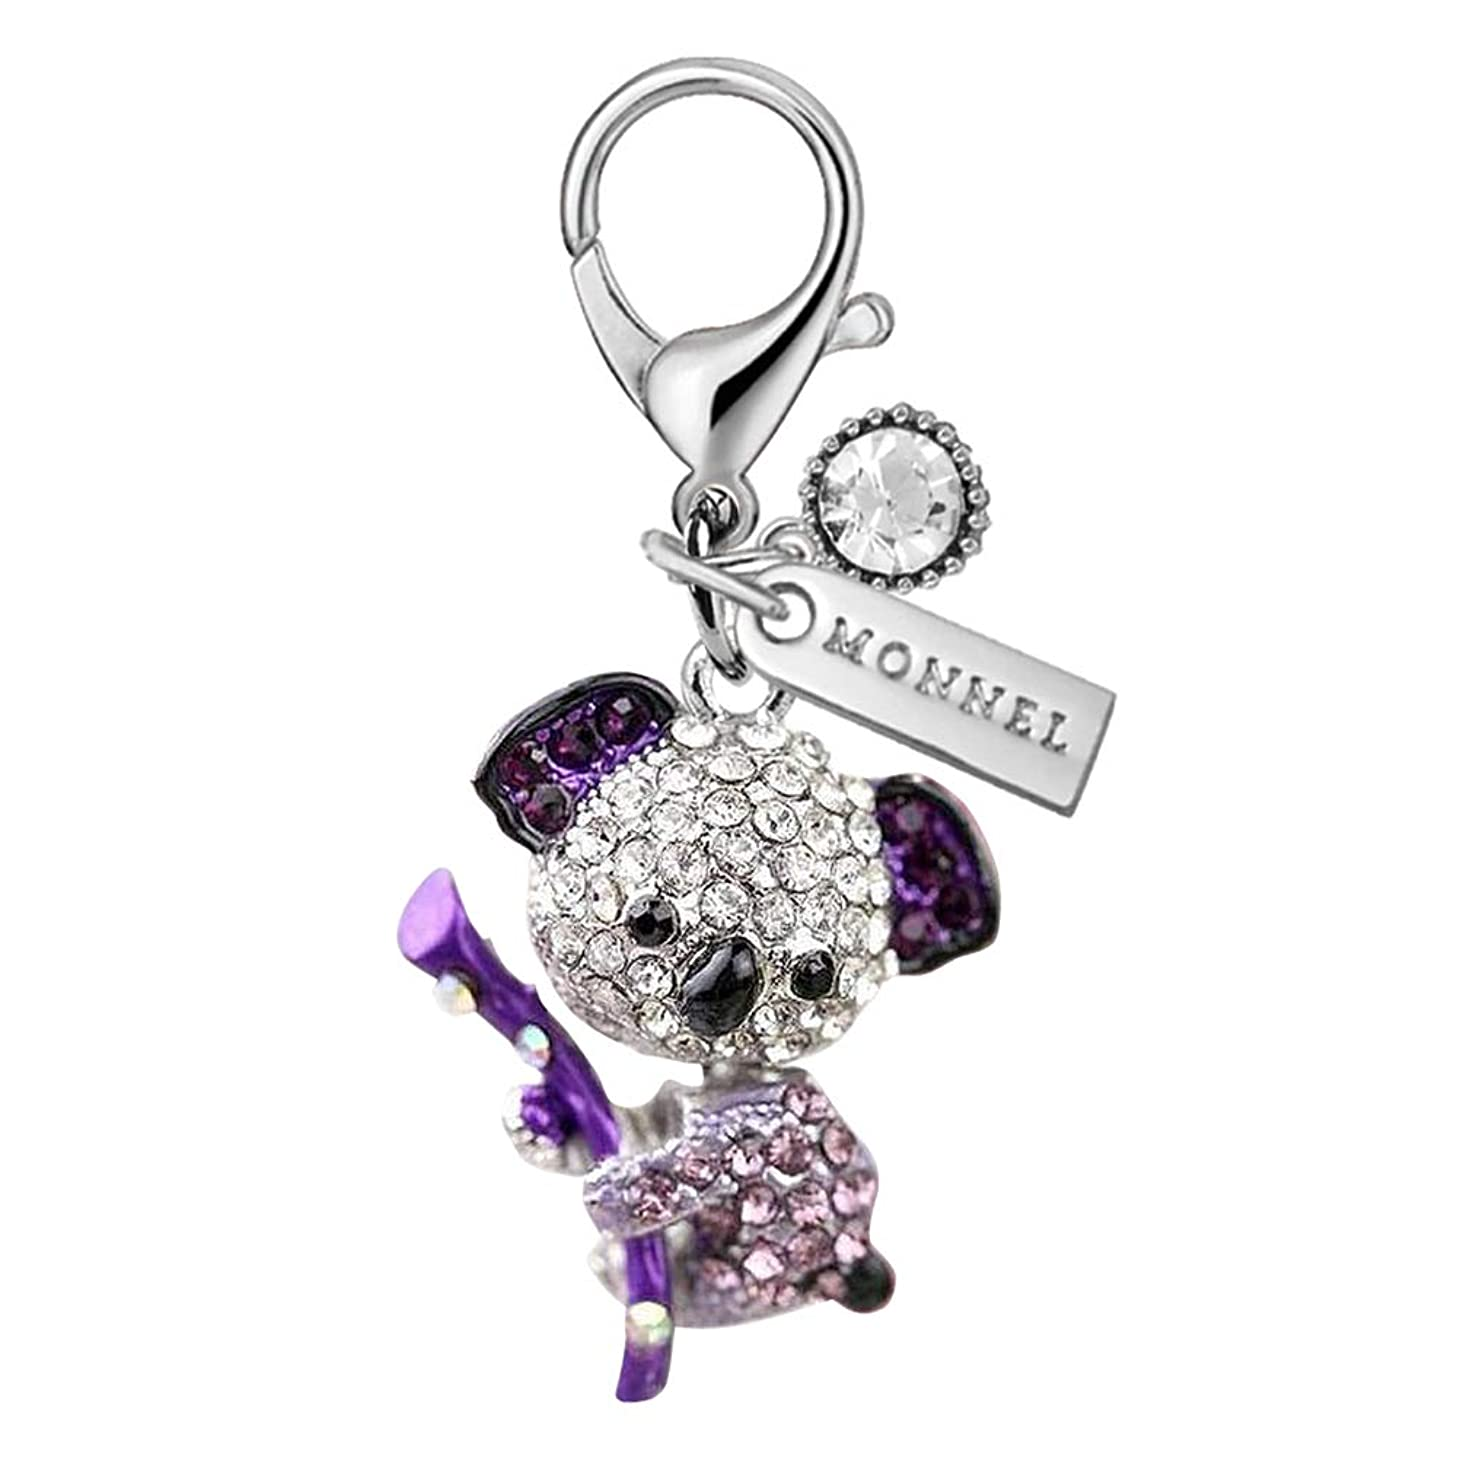 MC135 New Cute Purple Crystal Koala Bear Lobster Clasp Charm Pendant with Pouch Bag (1 Piece)